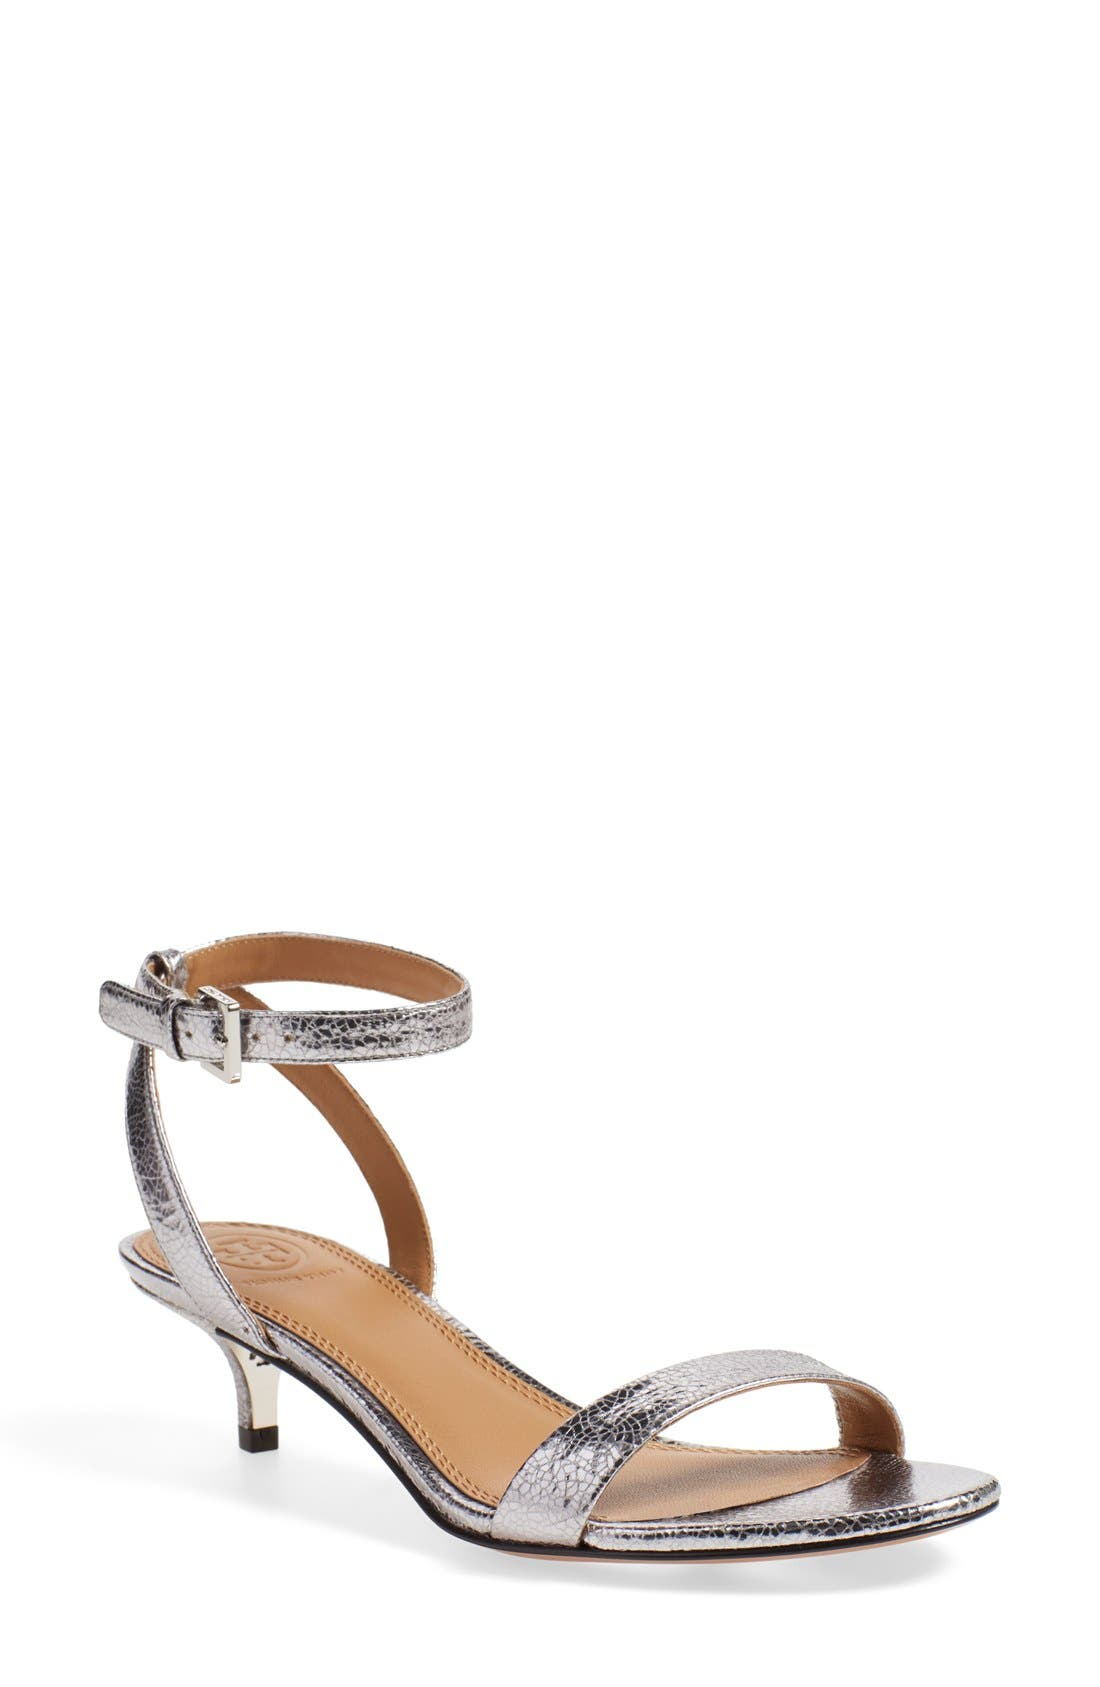 'Elana' Ankle Strap Sandal,                         Main,                         color, 043